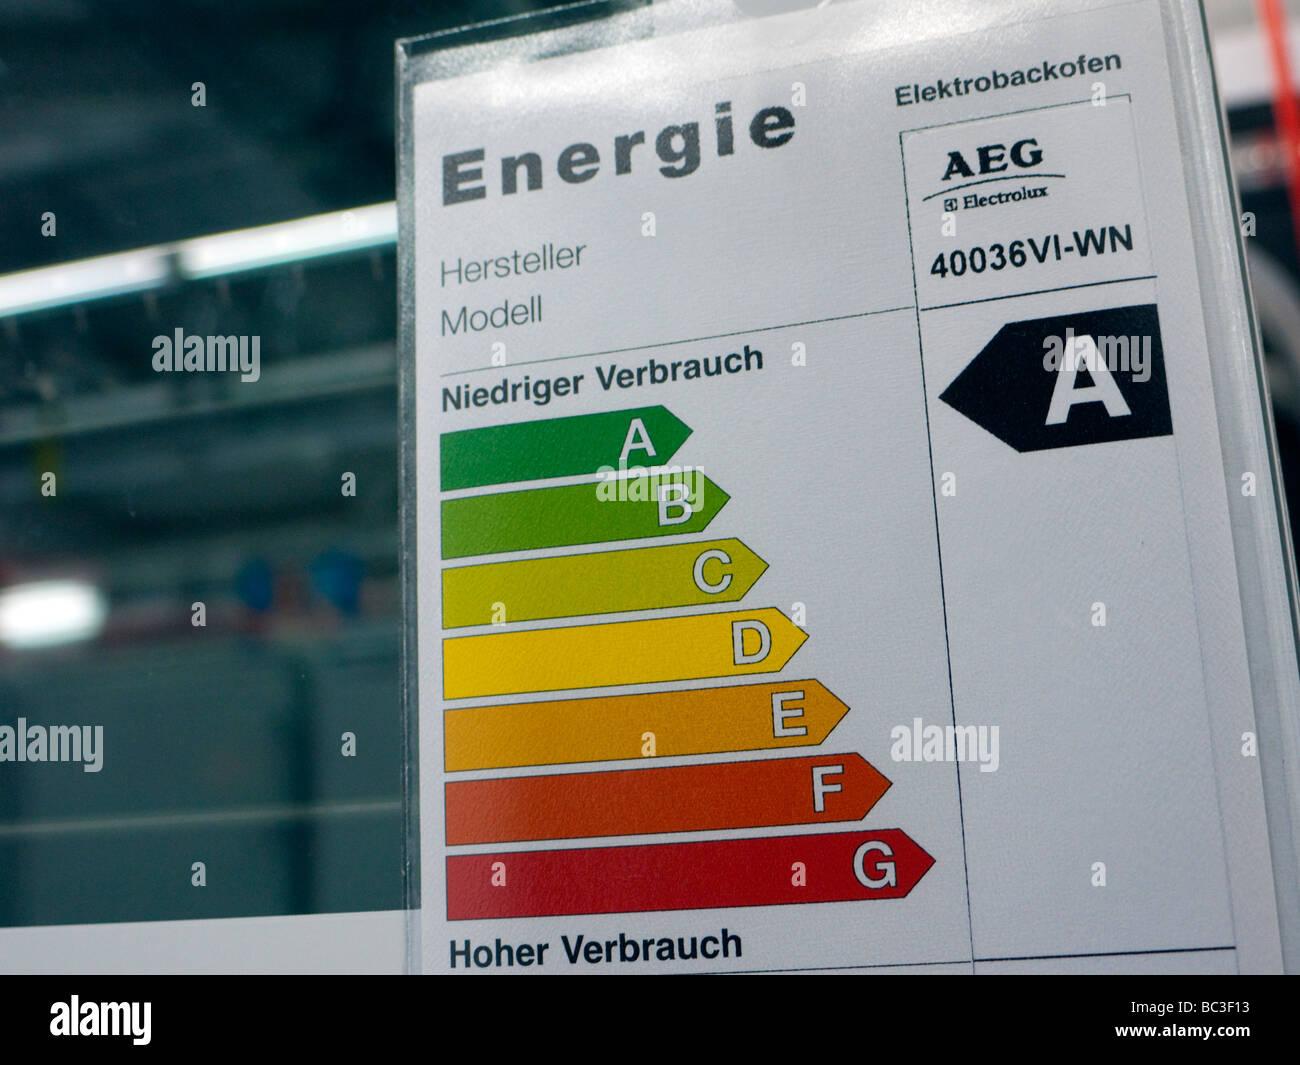 Energy Label Appliance Stock Photos & Energy Label Appliance Stock